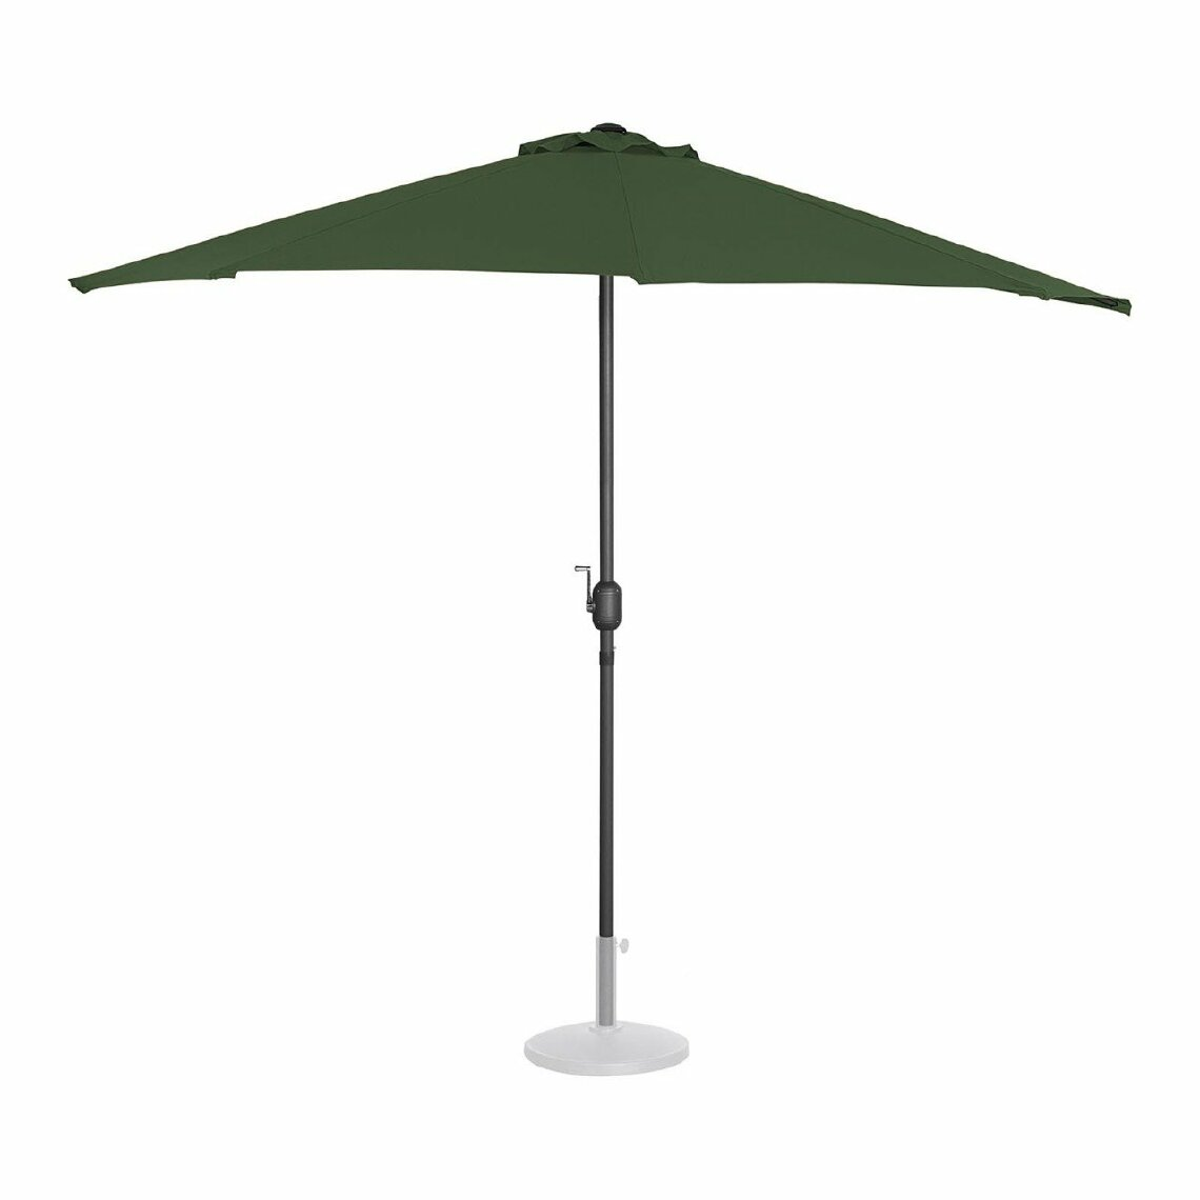 Helloshop26 Demi Parasol de jardin meuble abri terrasse pentagonal 270 x 135 cm vert 14_0001343